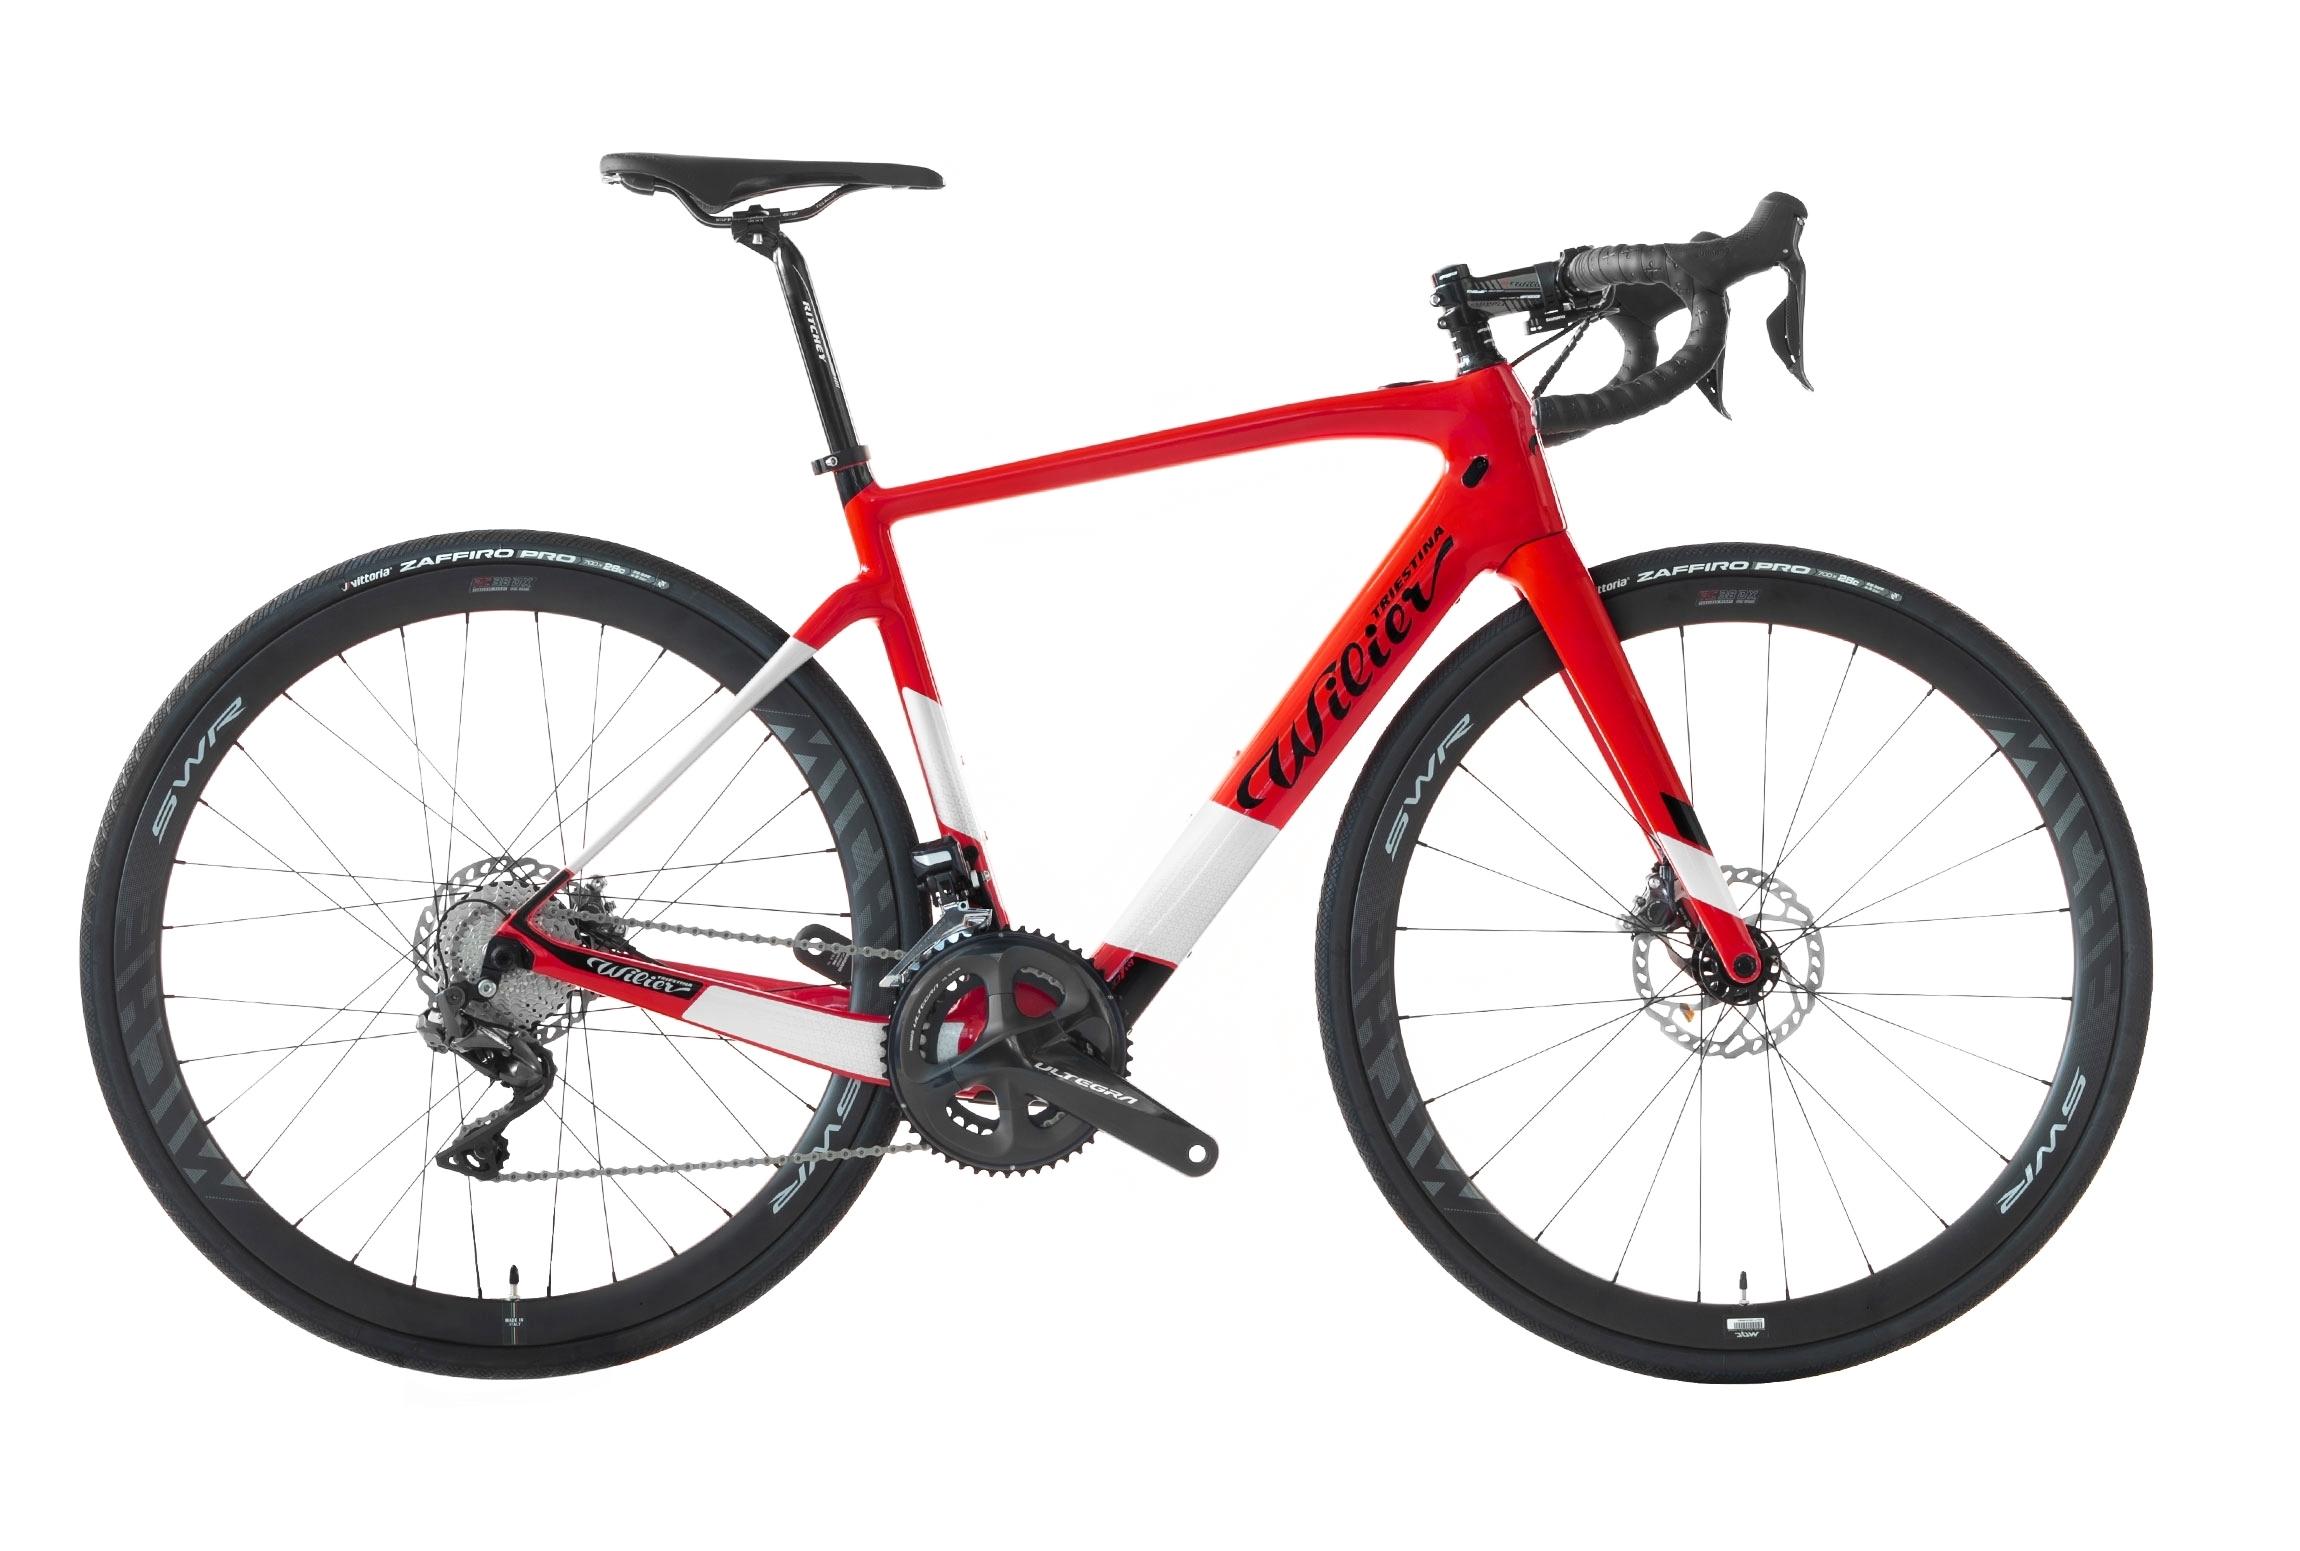 kolo CENTO1HY + ULTEGRA R8020+MICHE red glossy  XL